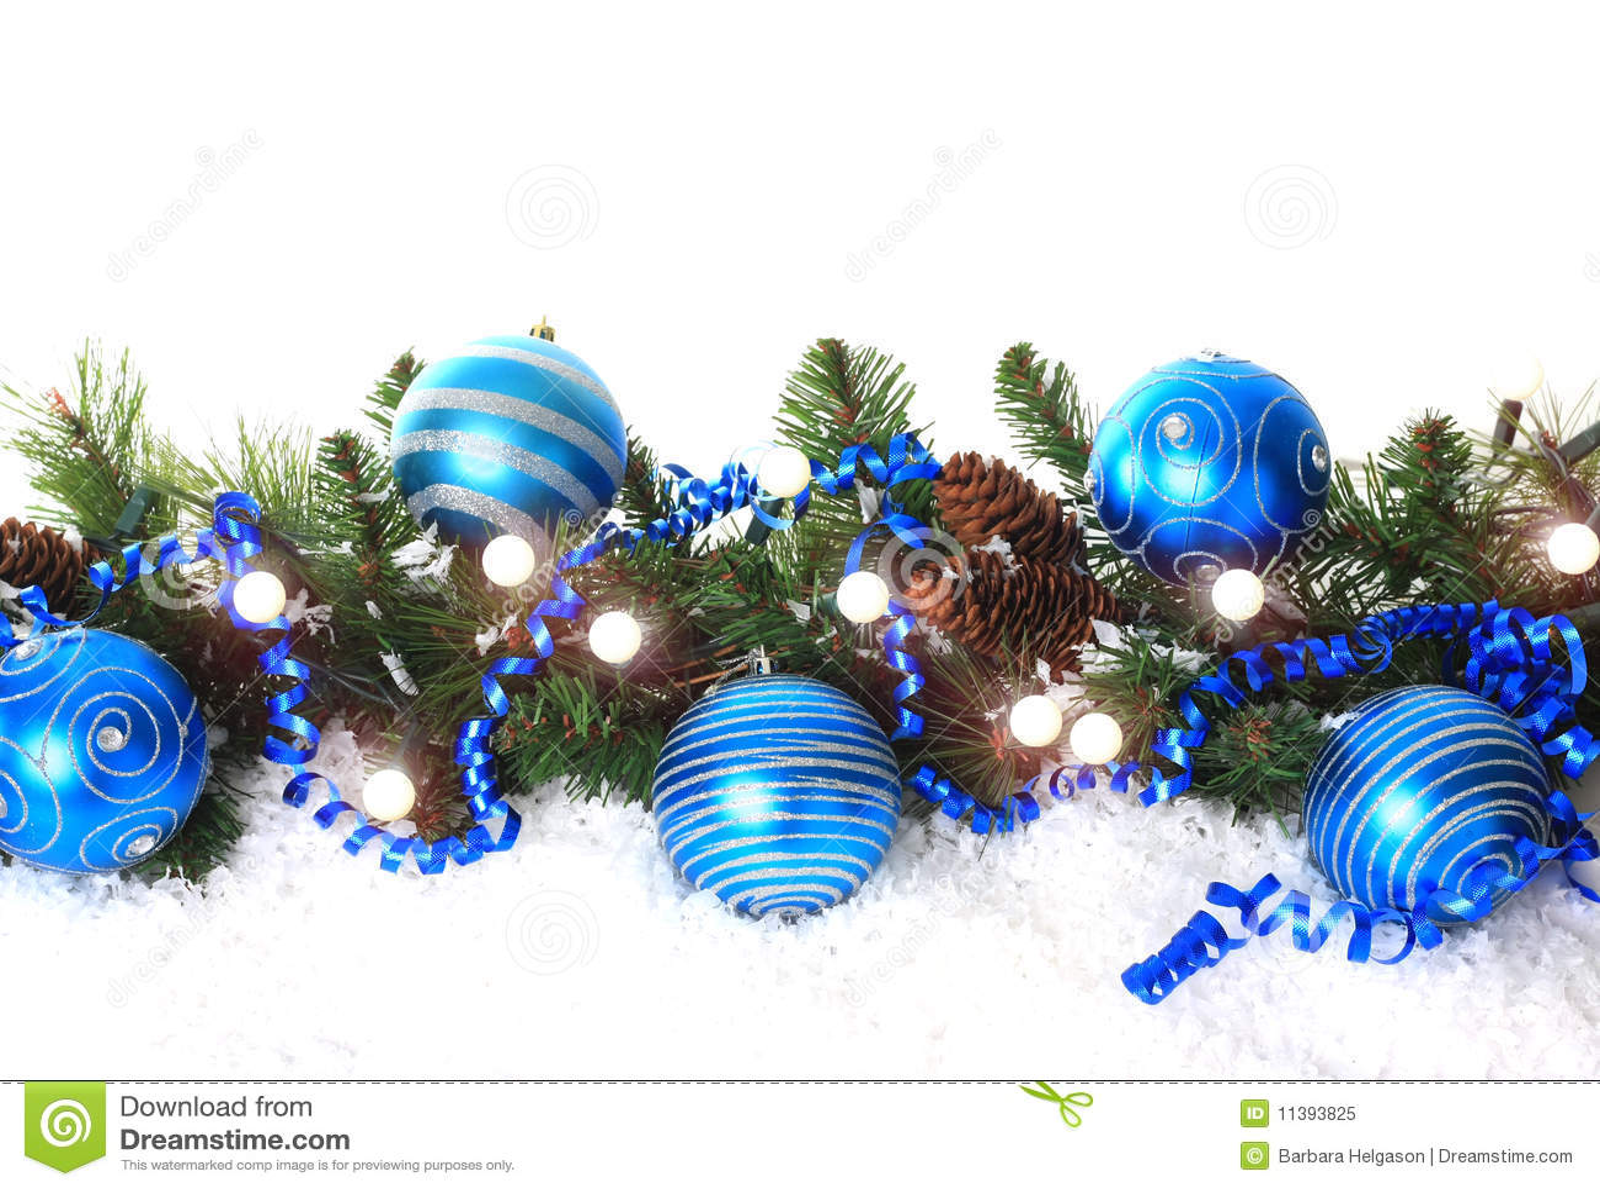 Blue Christmas Border Royalty Free Stock Photo - Image: 11393825